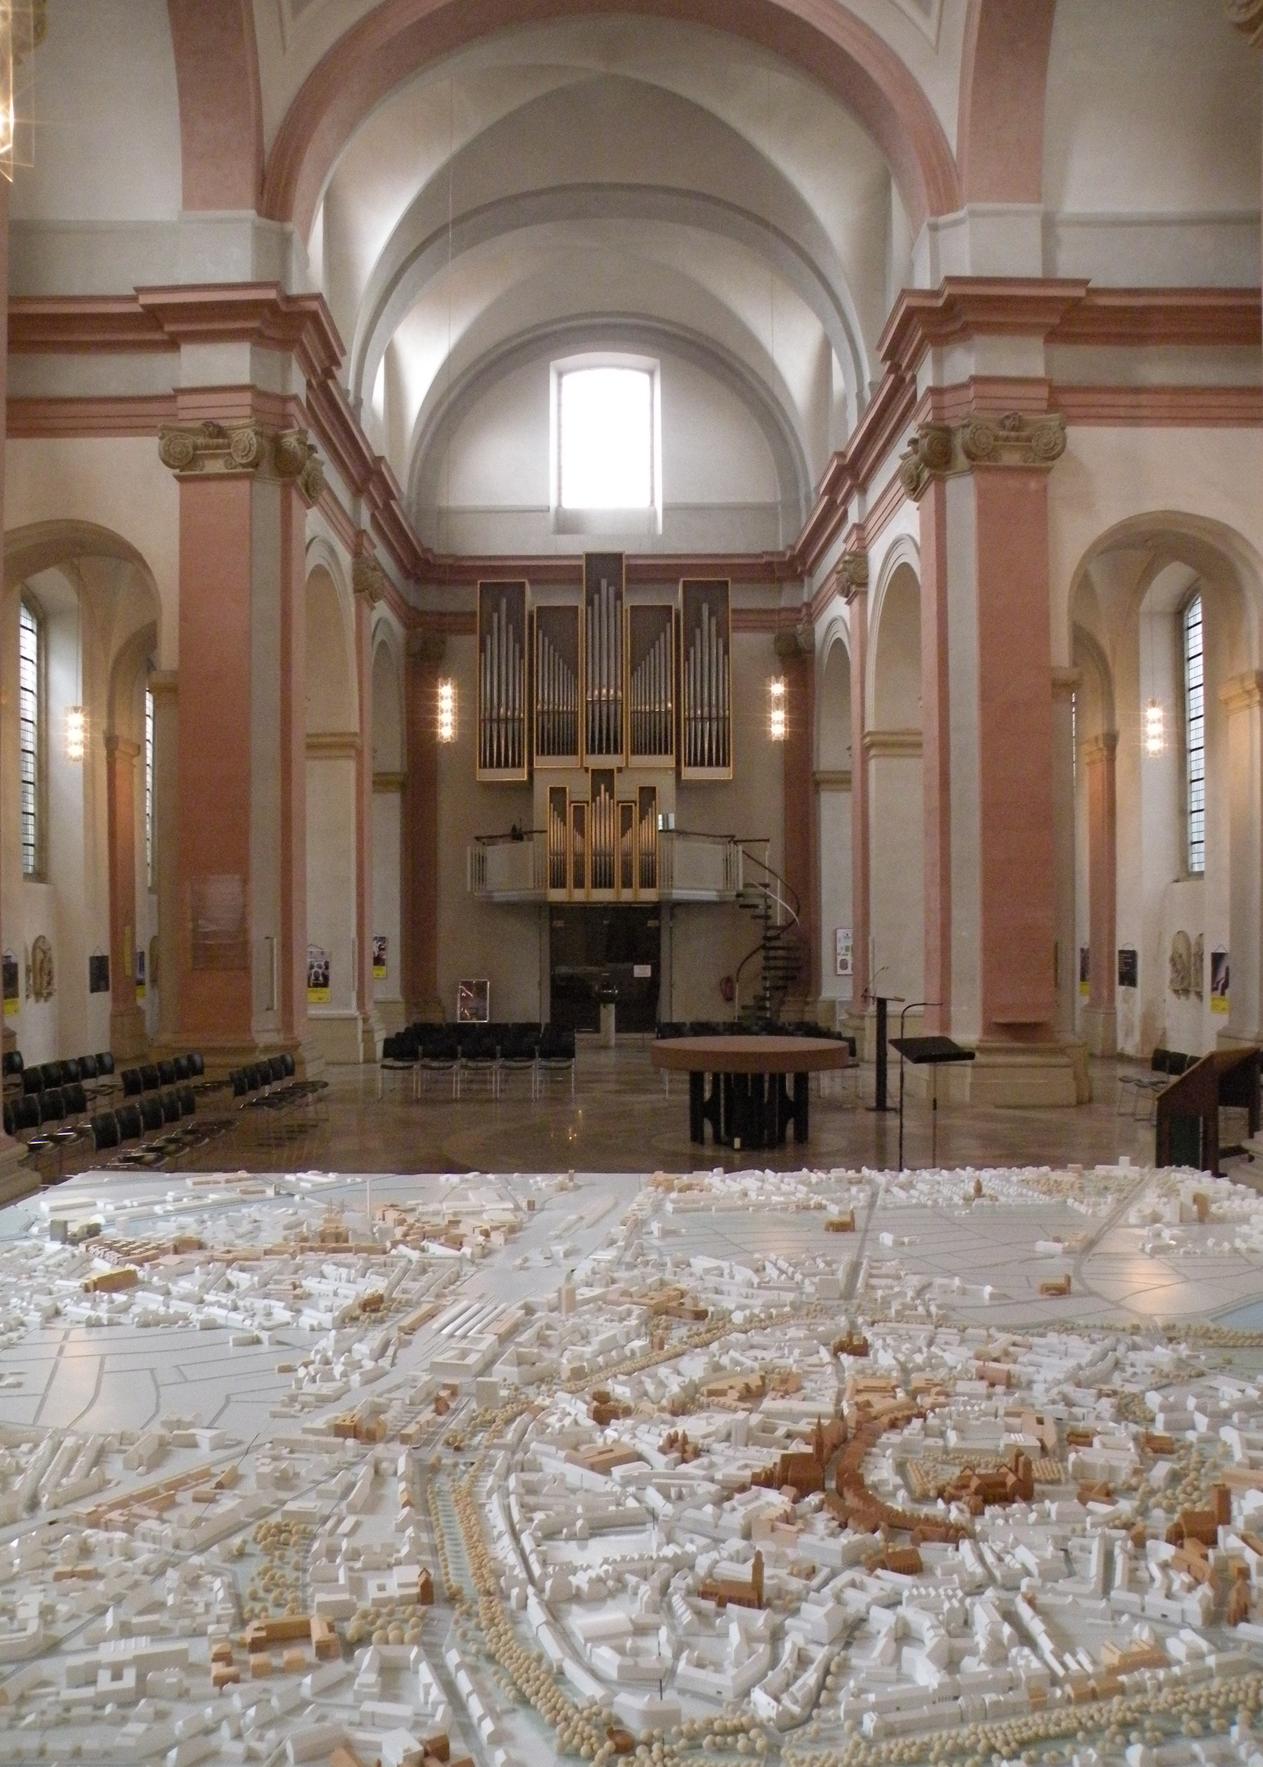 Münster Modell: Ausstellung Nr. 20 - Dominikanerkirche, 2016 - Foto: Stefan Rethfeld